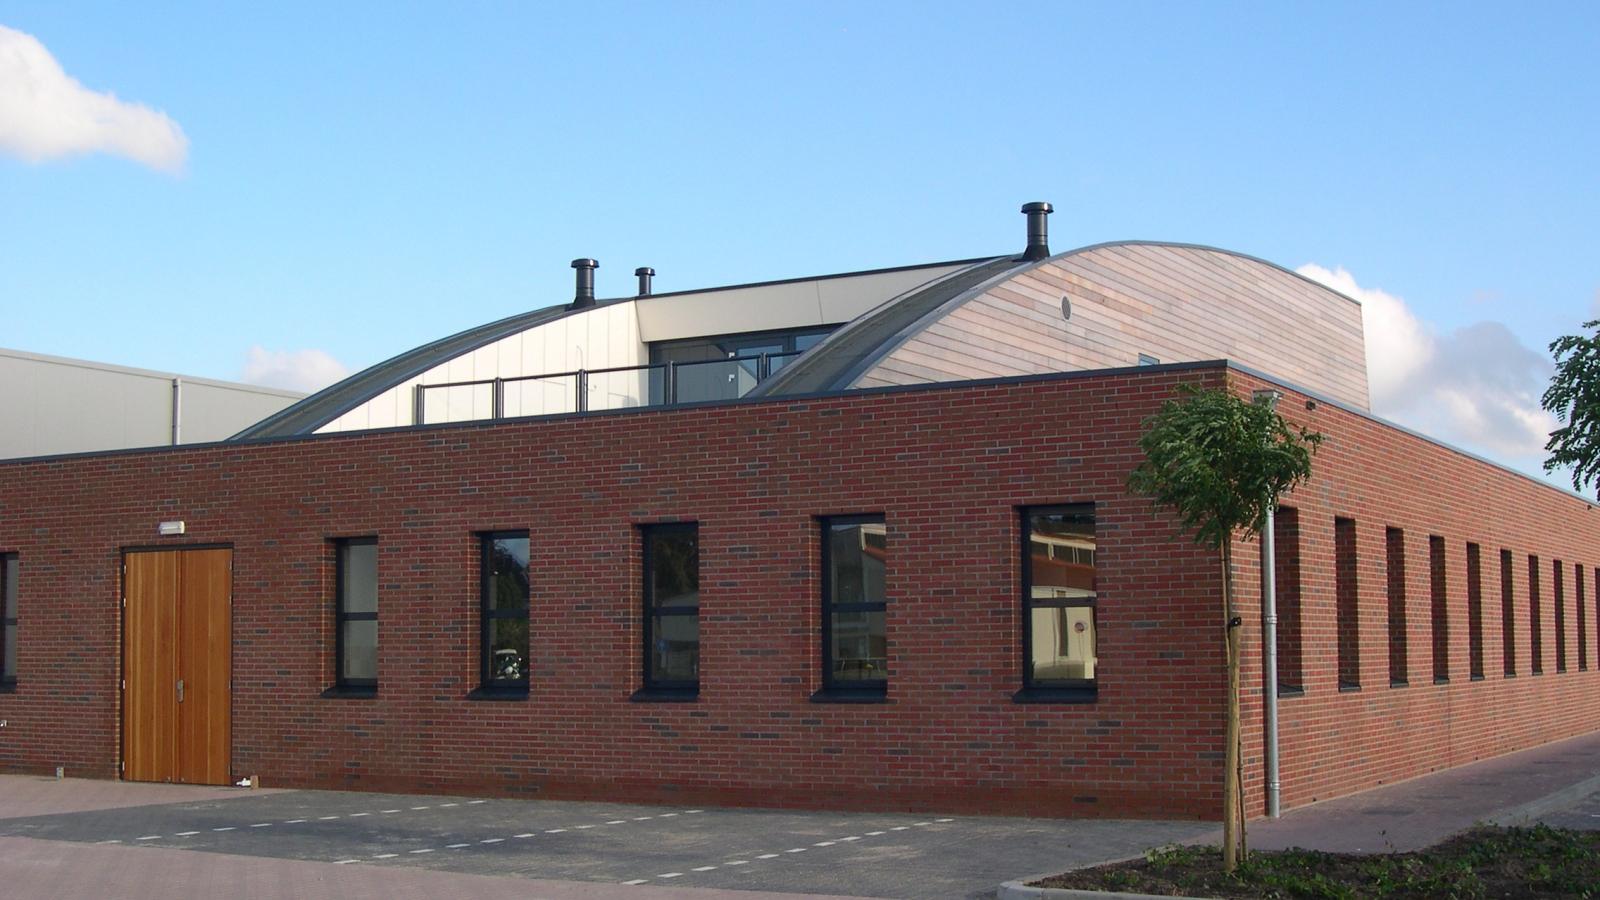 Dierenkliniek De Woldberg Steenwijk